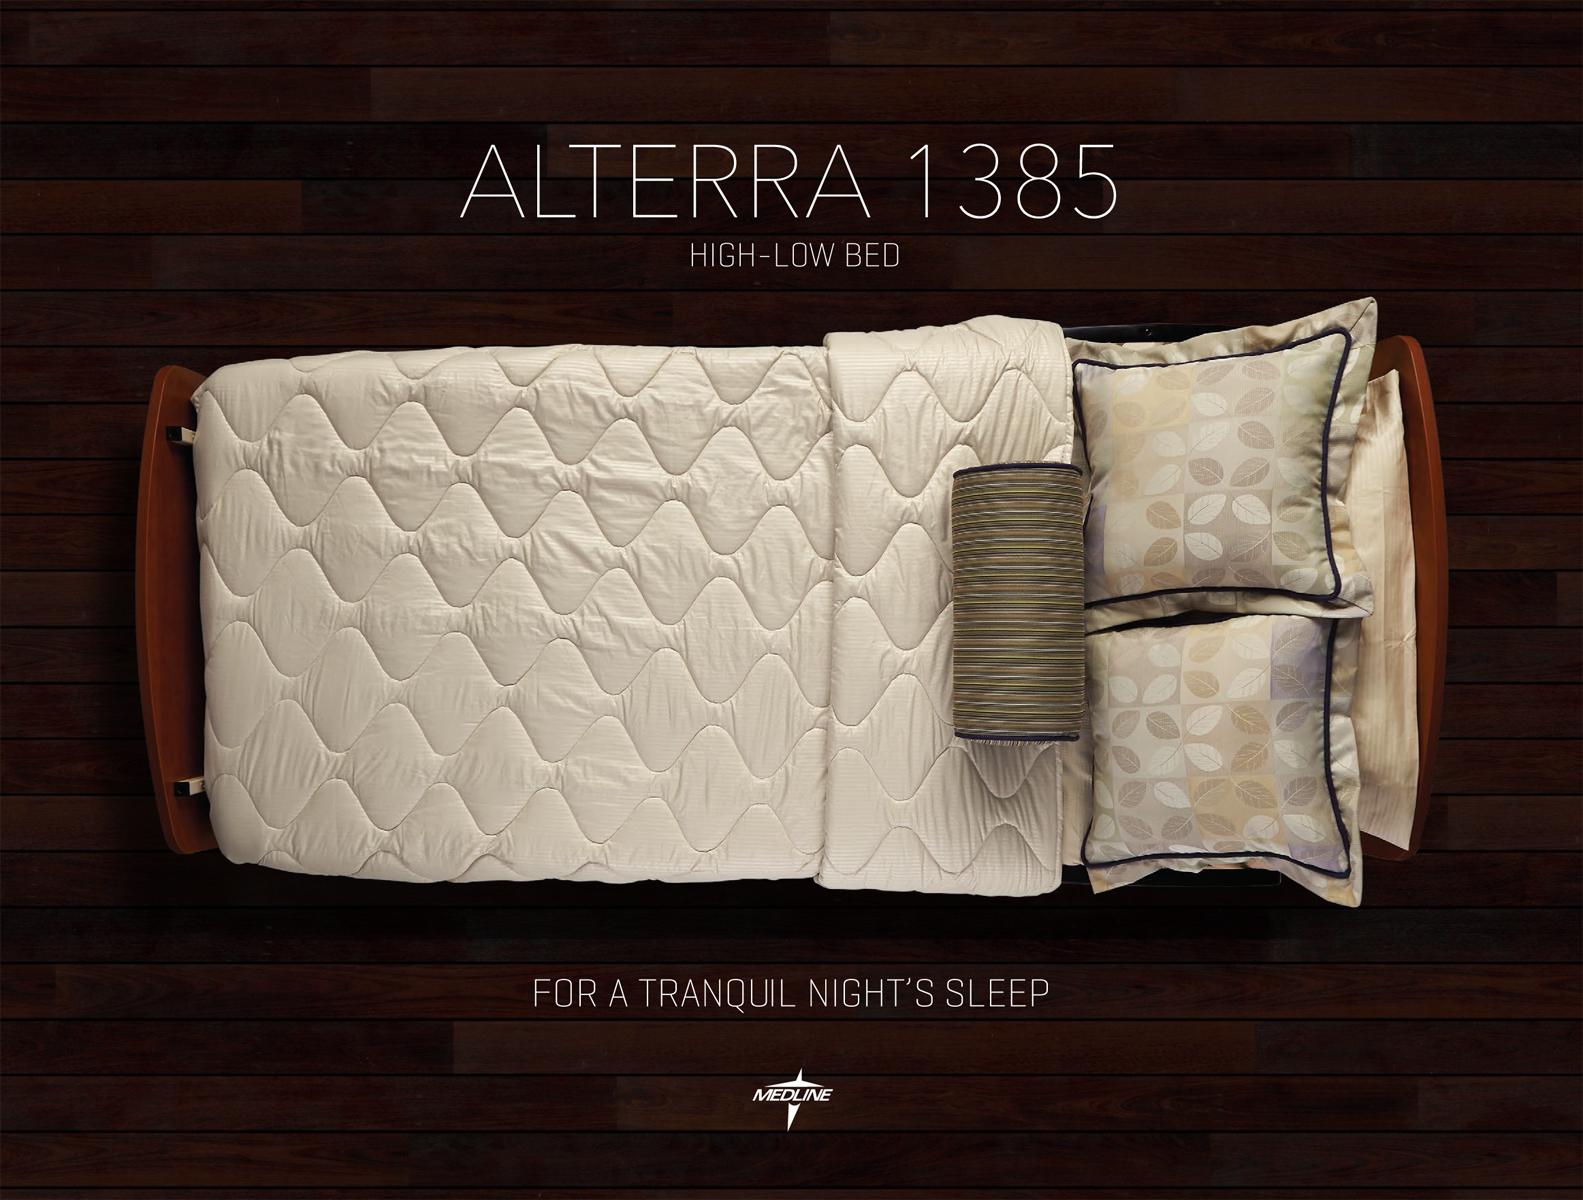 medline alterra 1385 frame is more durable & stable